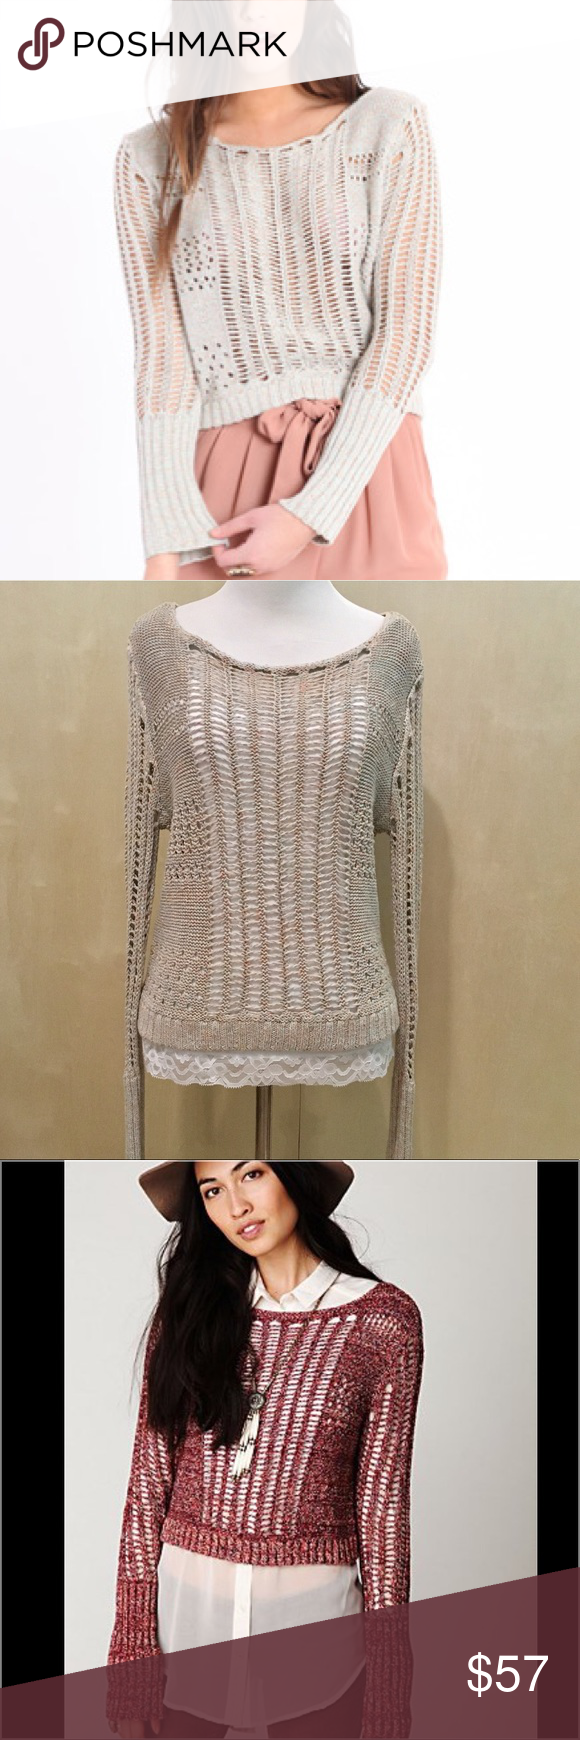 Layered Sweater Blouse Combo Anlis